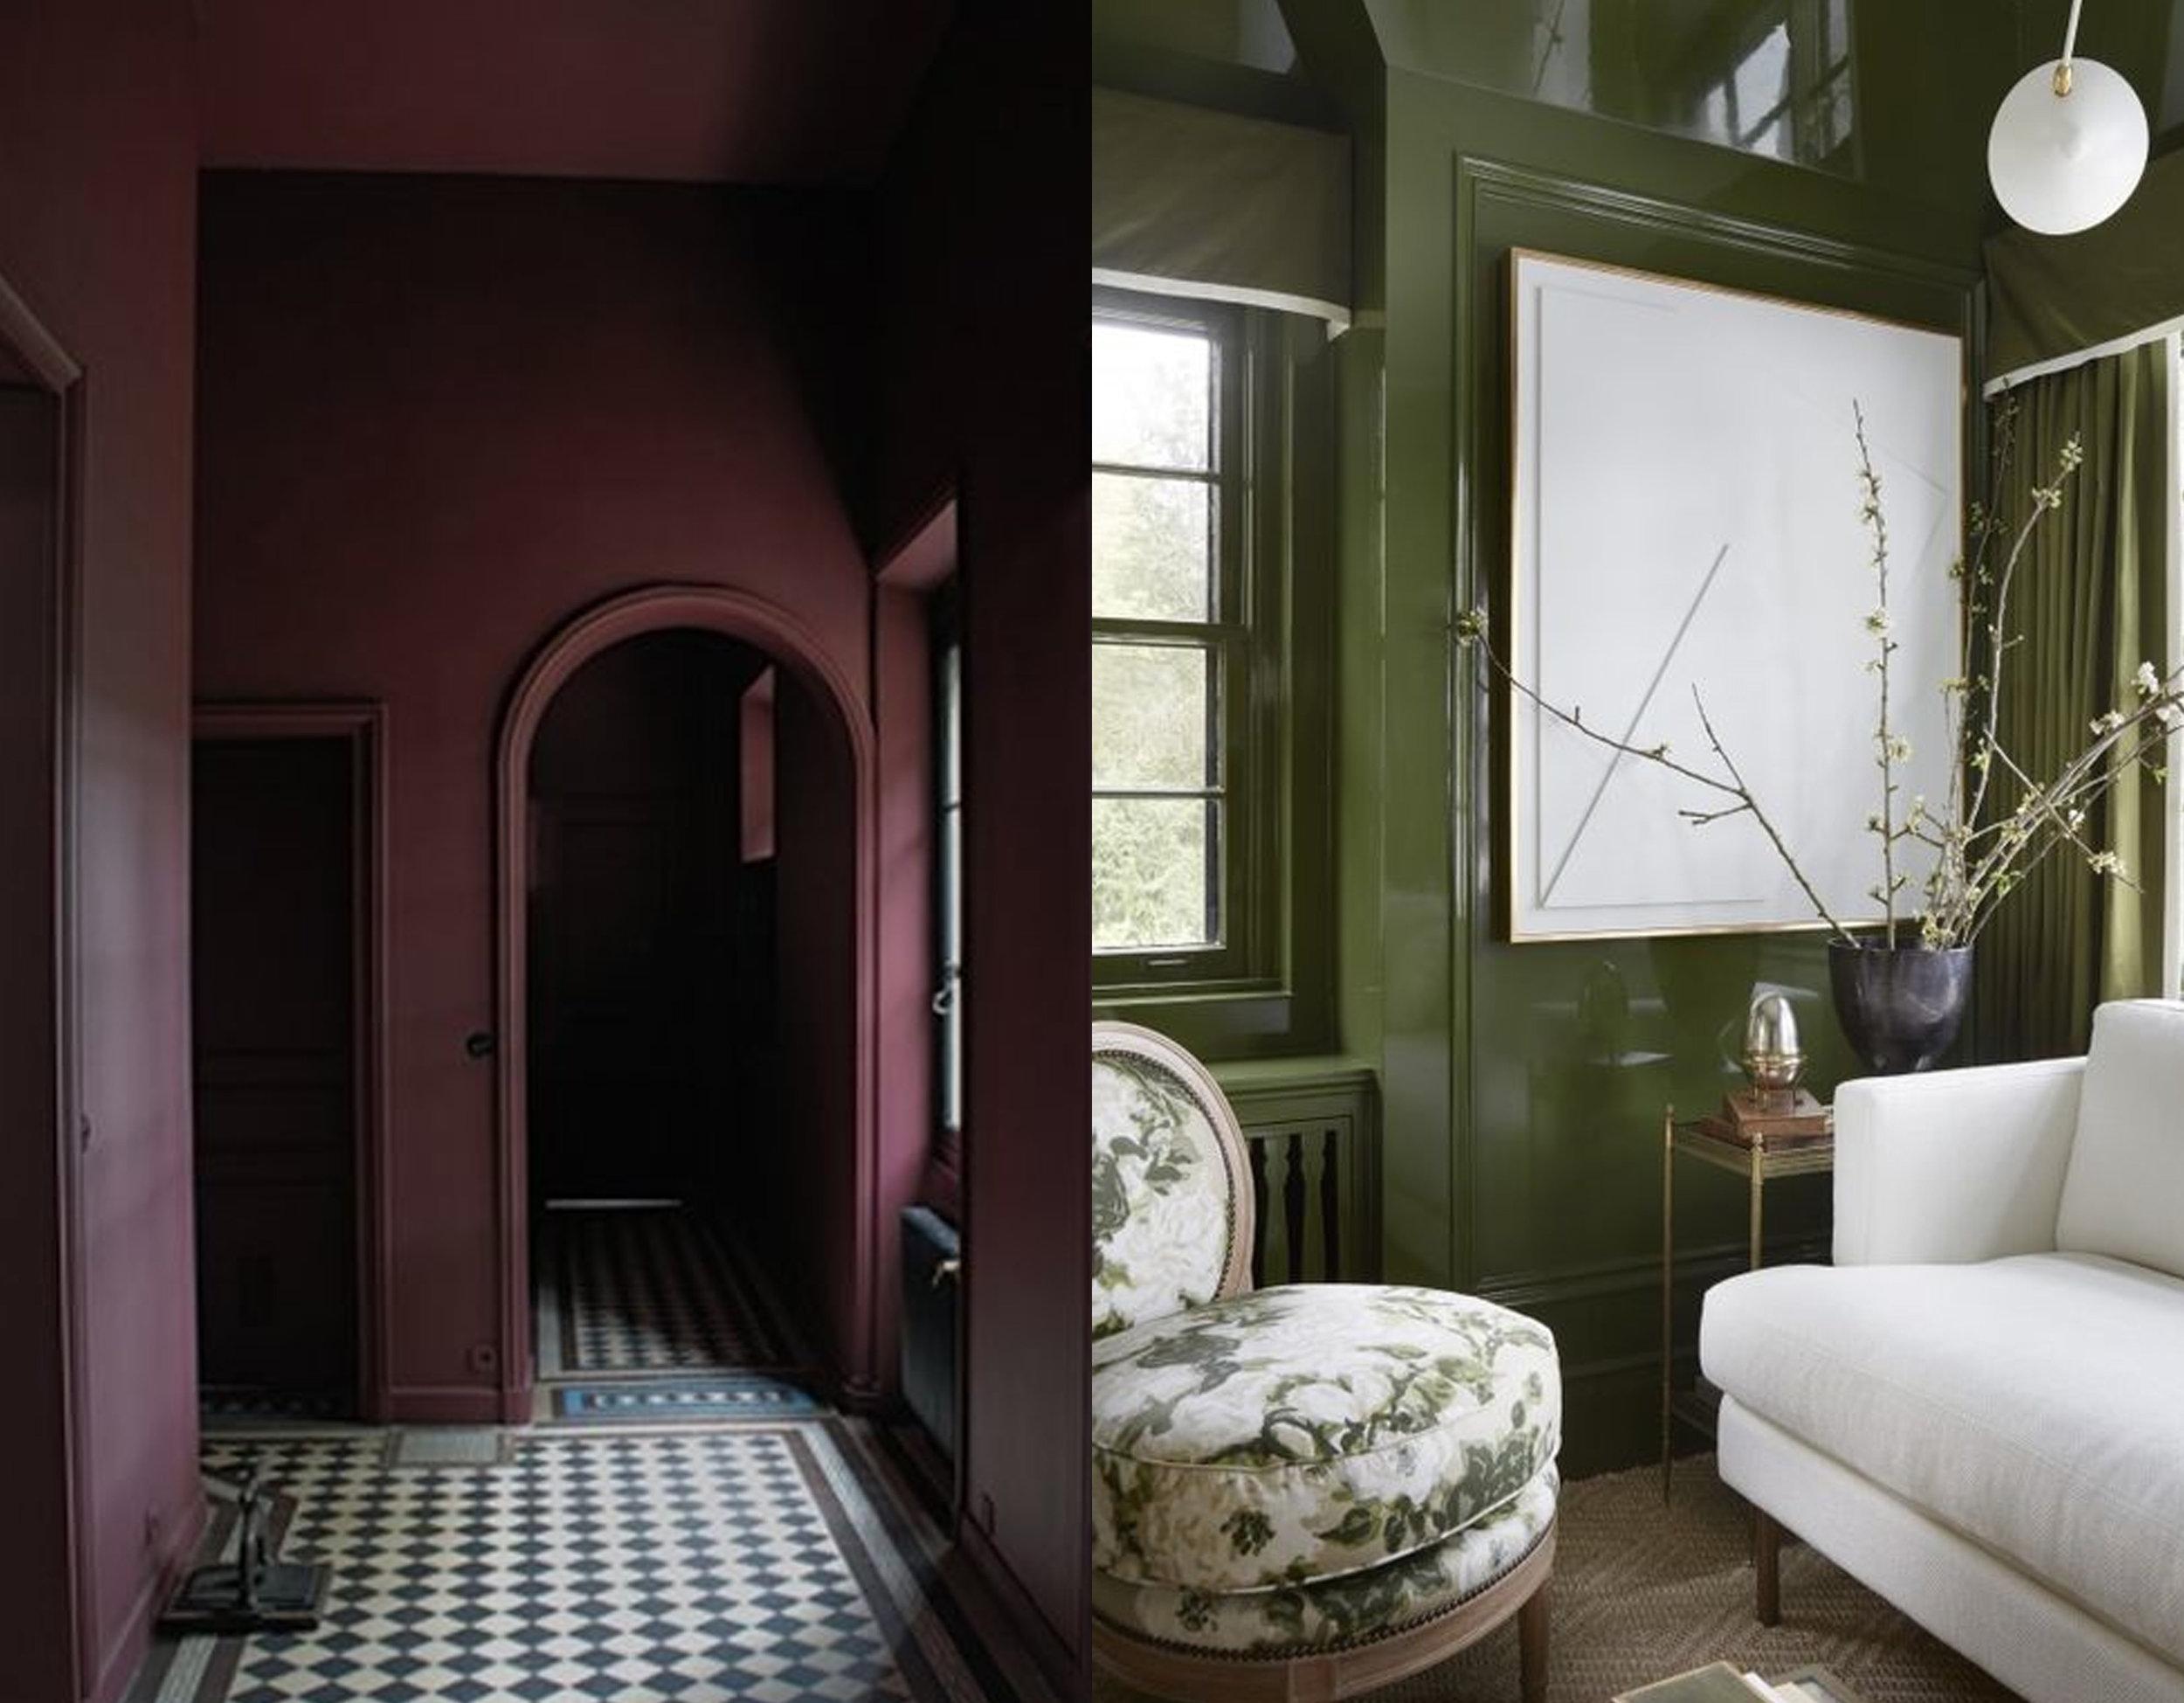 Mat versus glossy:dark interior via  Pinterest  - glossy interior via  Marie Flanigan